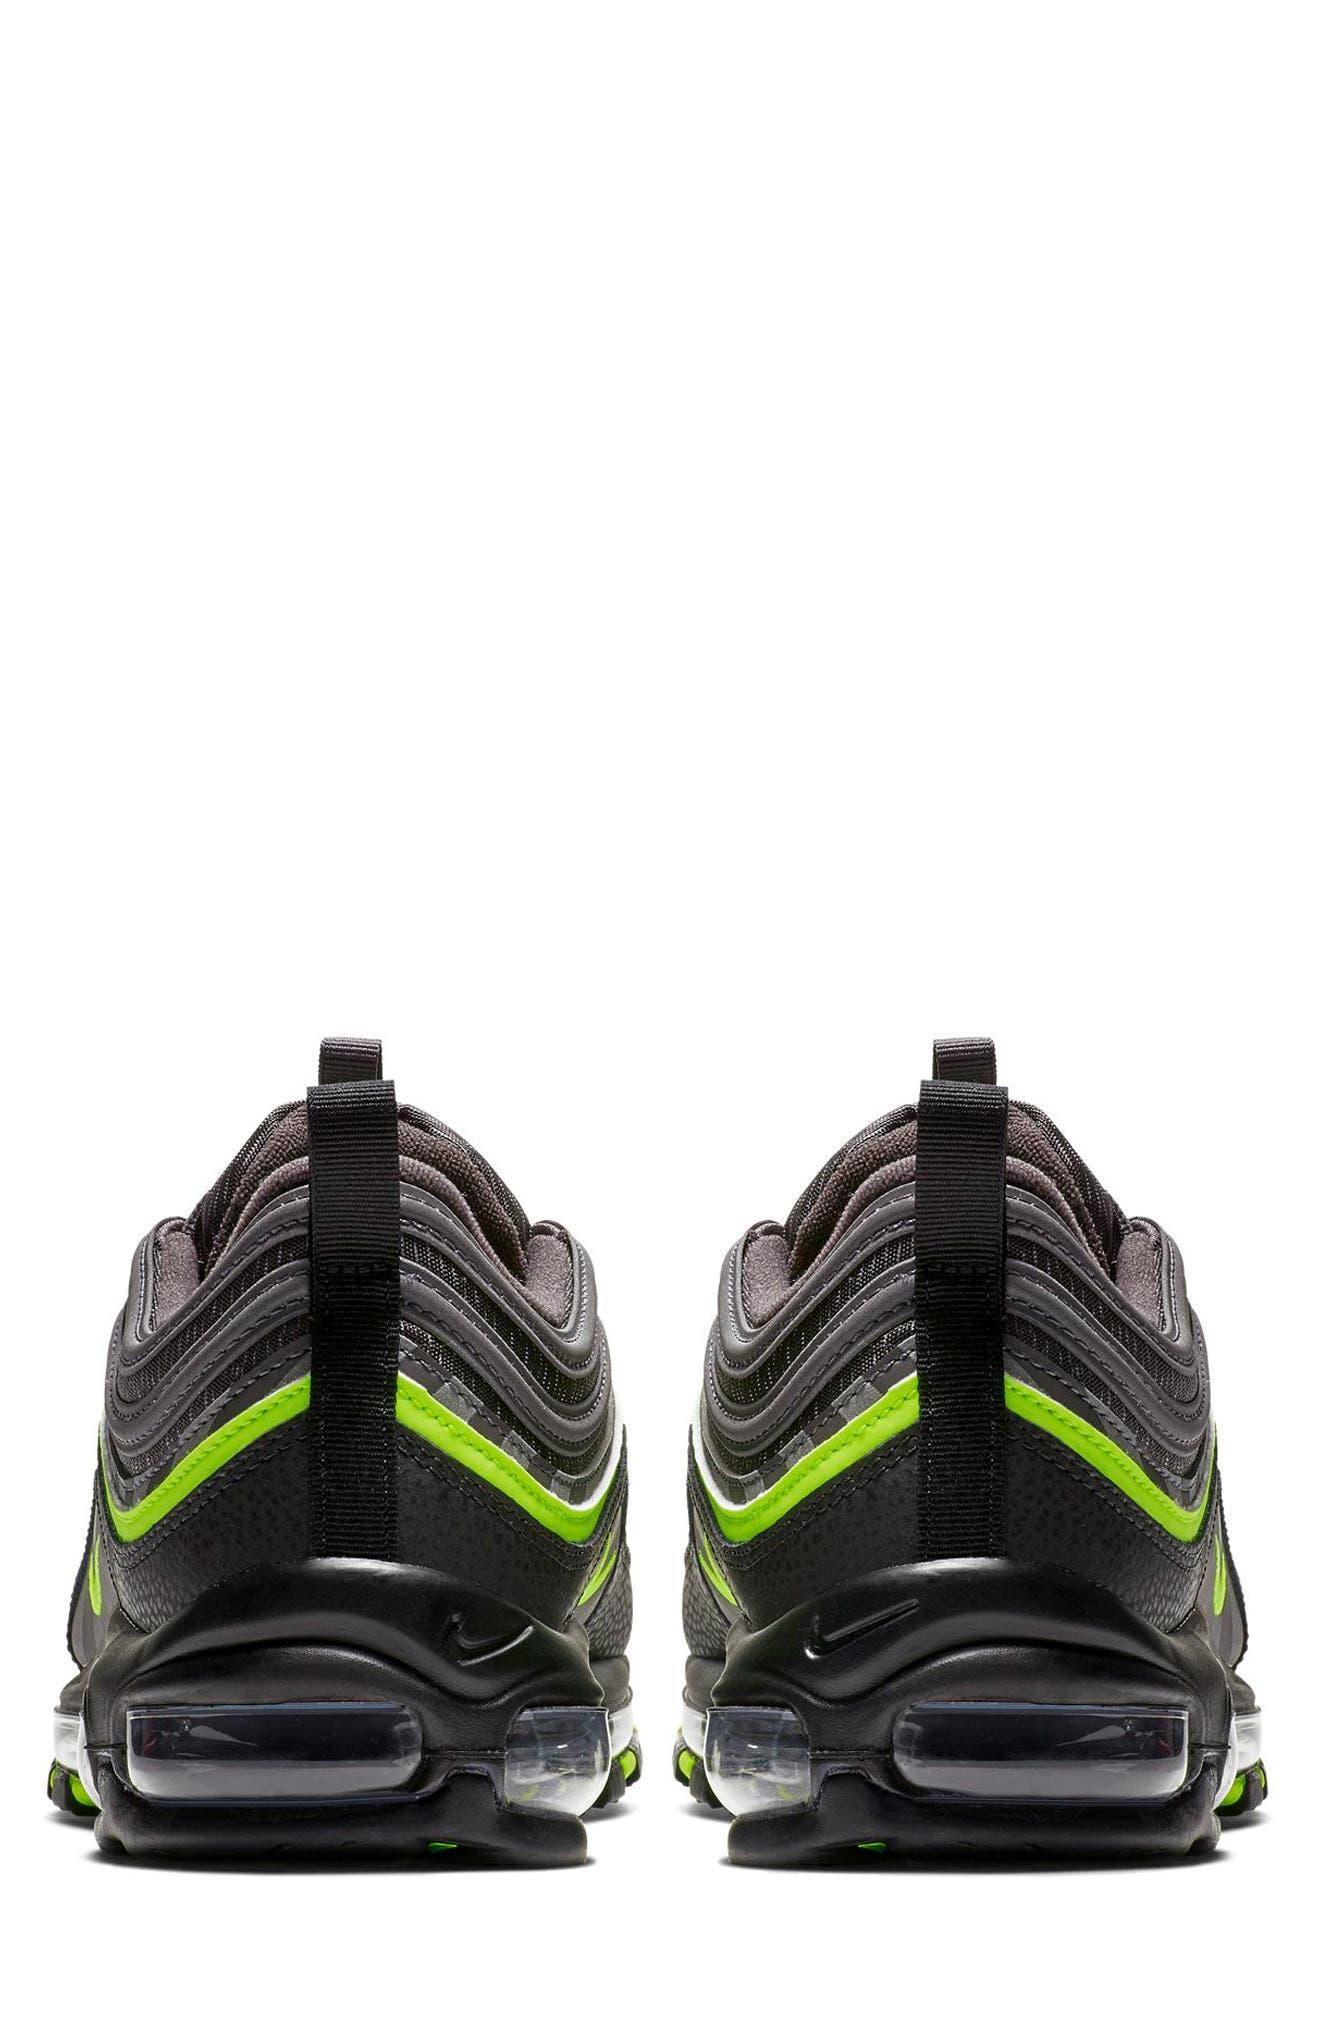 Air Max 97 Sneaker,                             Alternate thumbnail 2, color,                             THUNDER GREY/ LIME/ BLACK